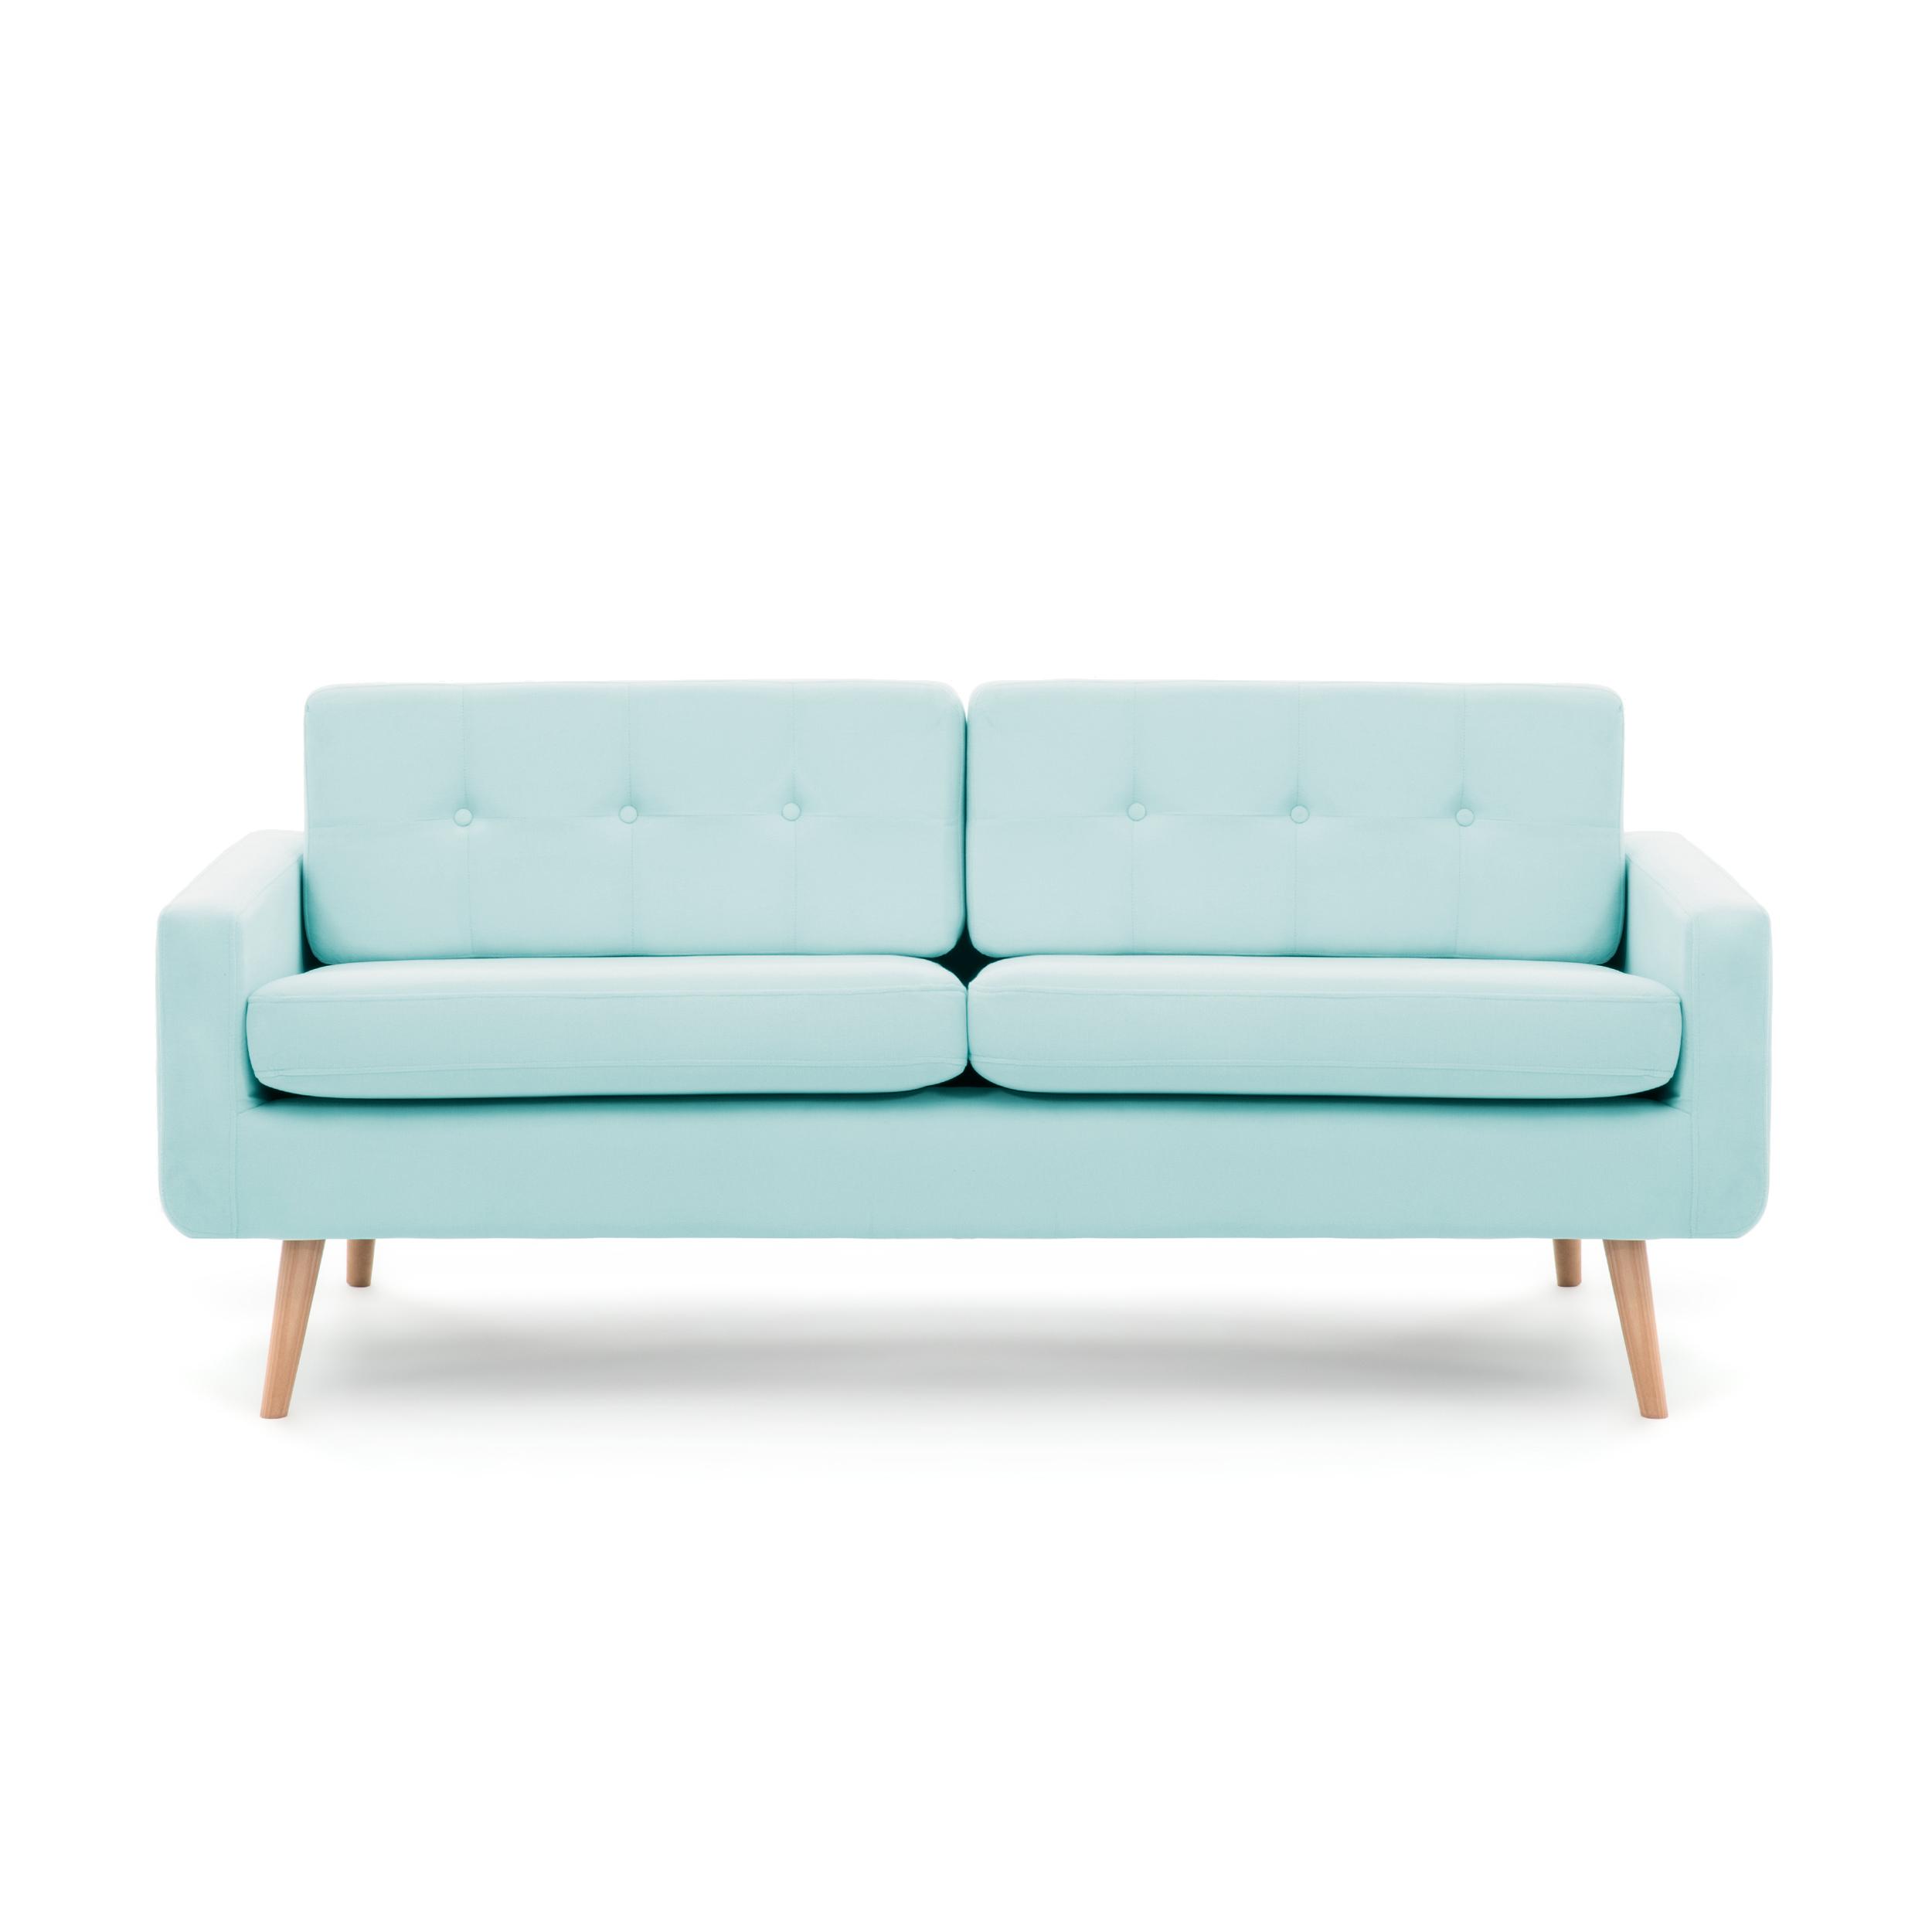 Canapea Fixa 3 Locuri Ina Pastel Blue